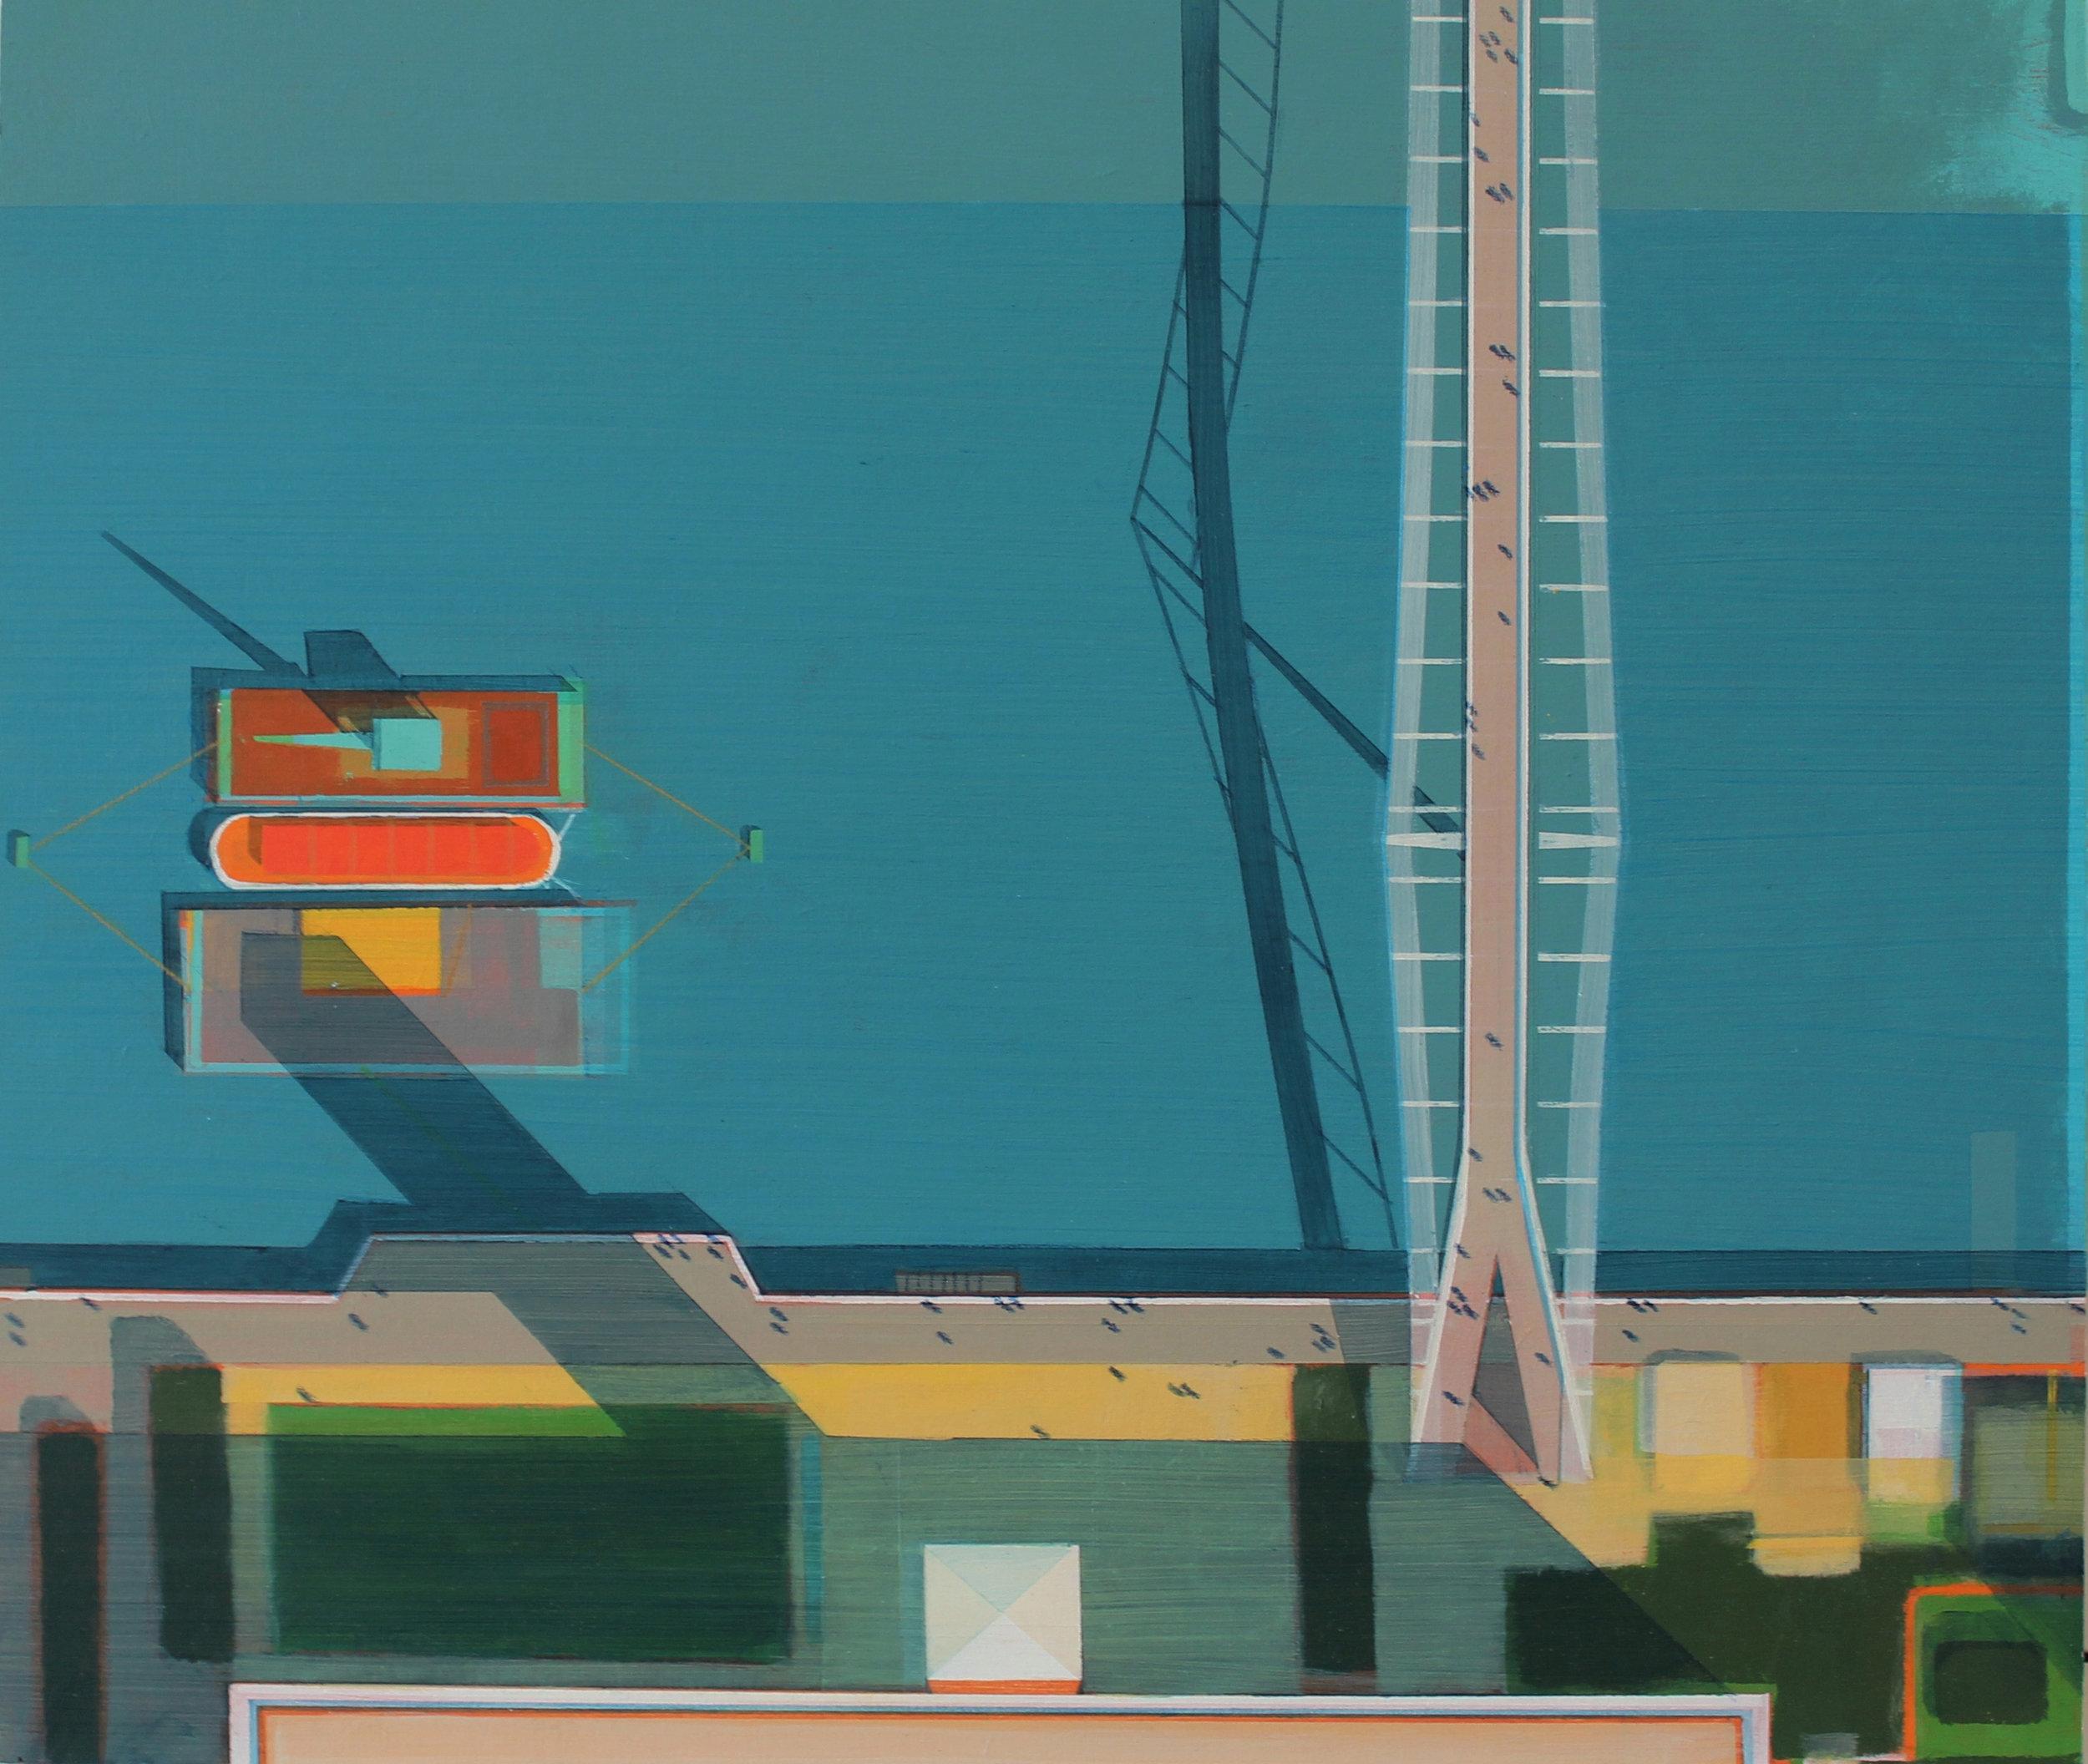 Millenium Bridge and Tate Modern.